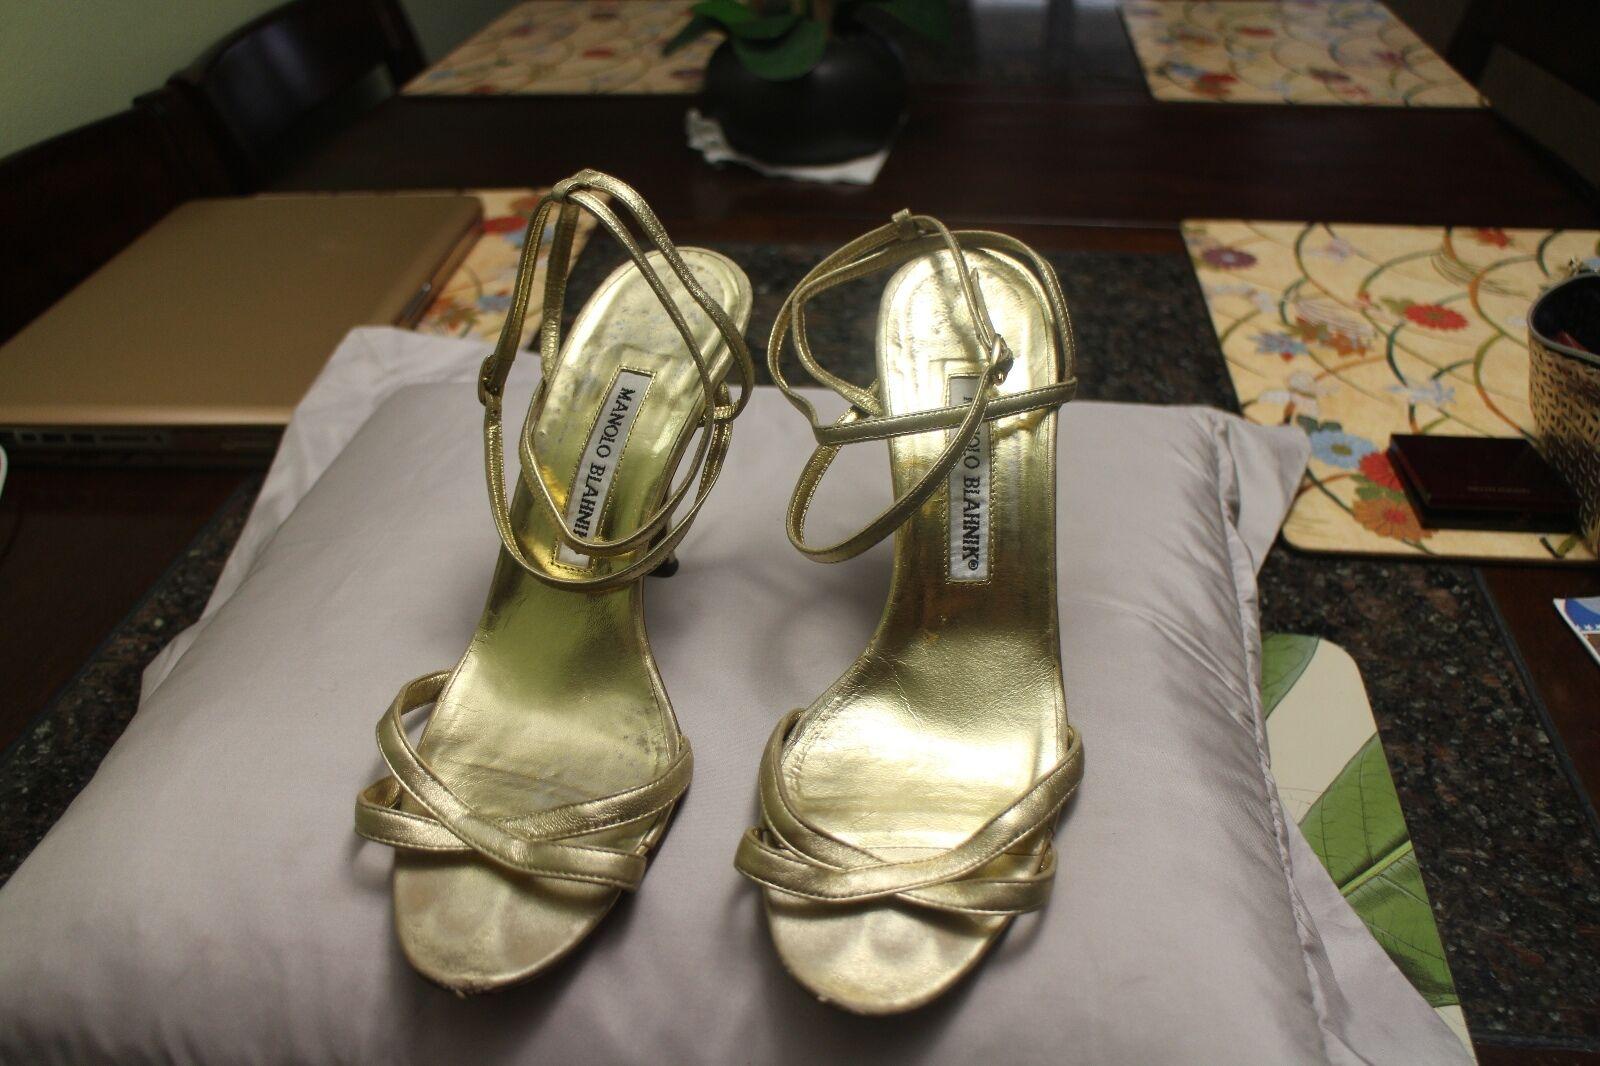 designer online Manolo Blahnik oro  ankle wrap high heel Sandals    38 us sz 8  vendita online sconto prezzo basso